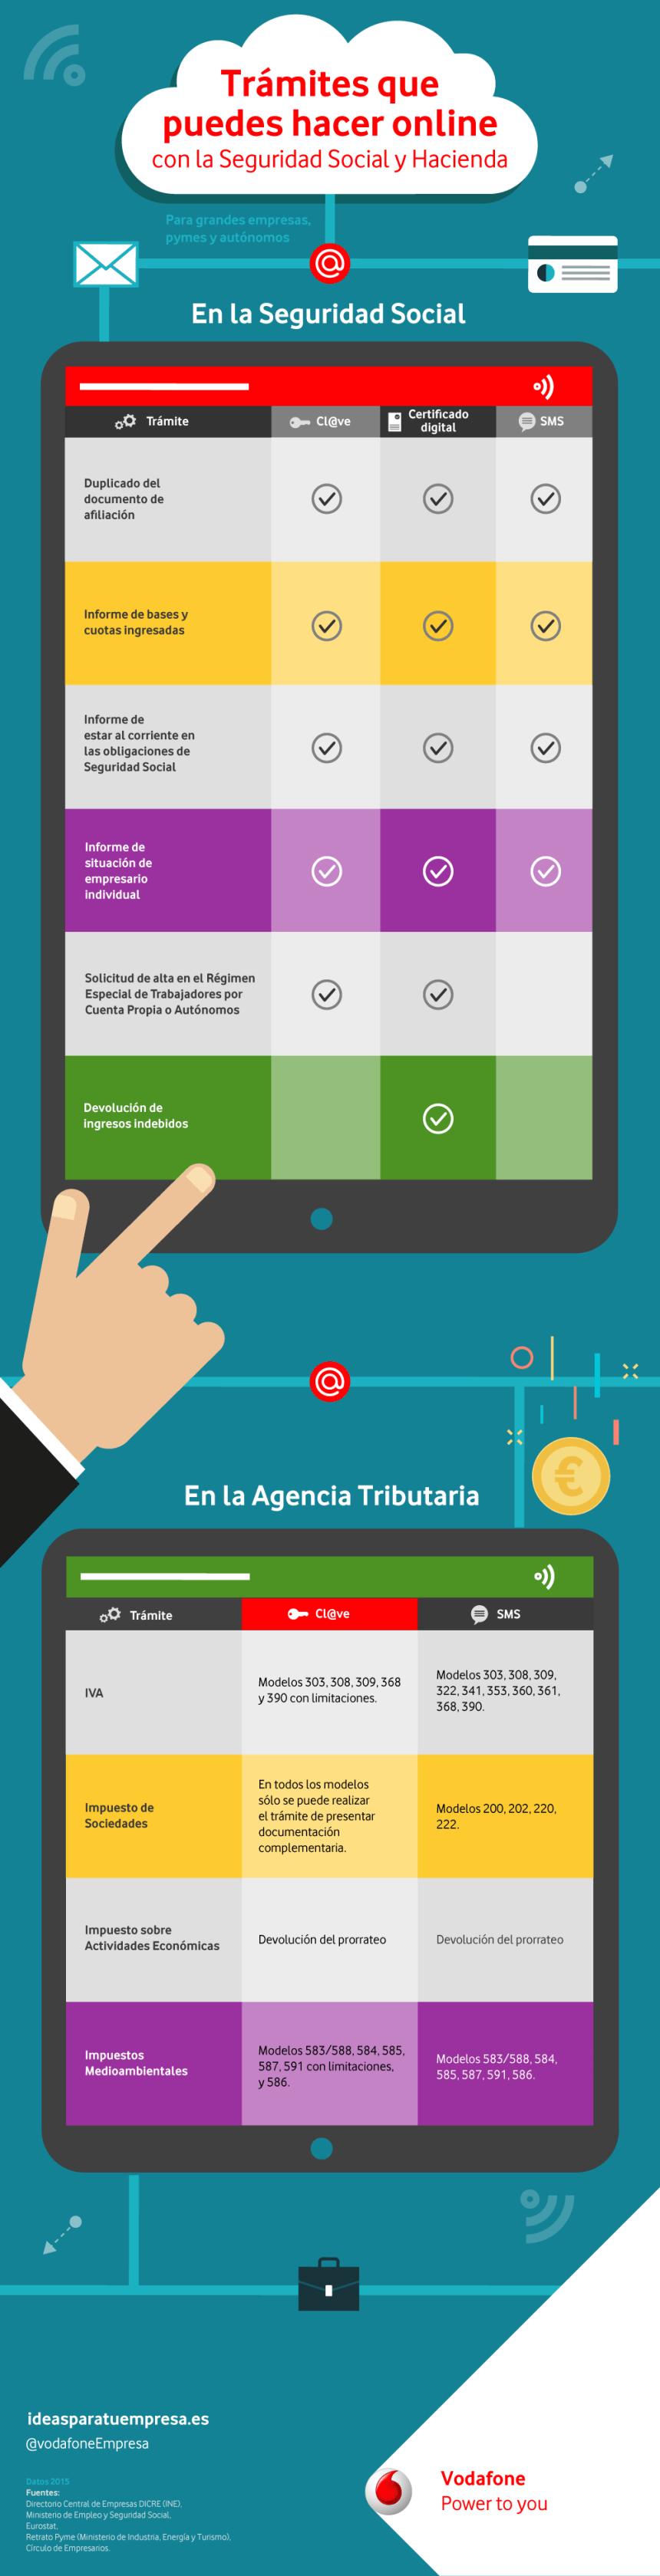 tramites-online-empresas-infografia